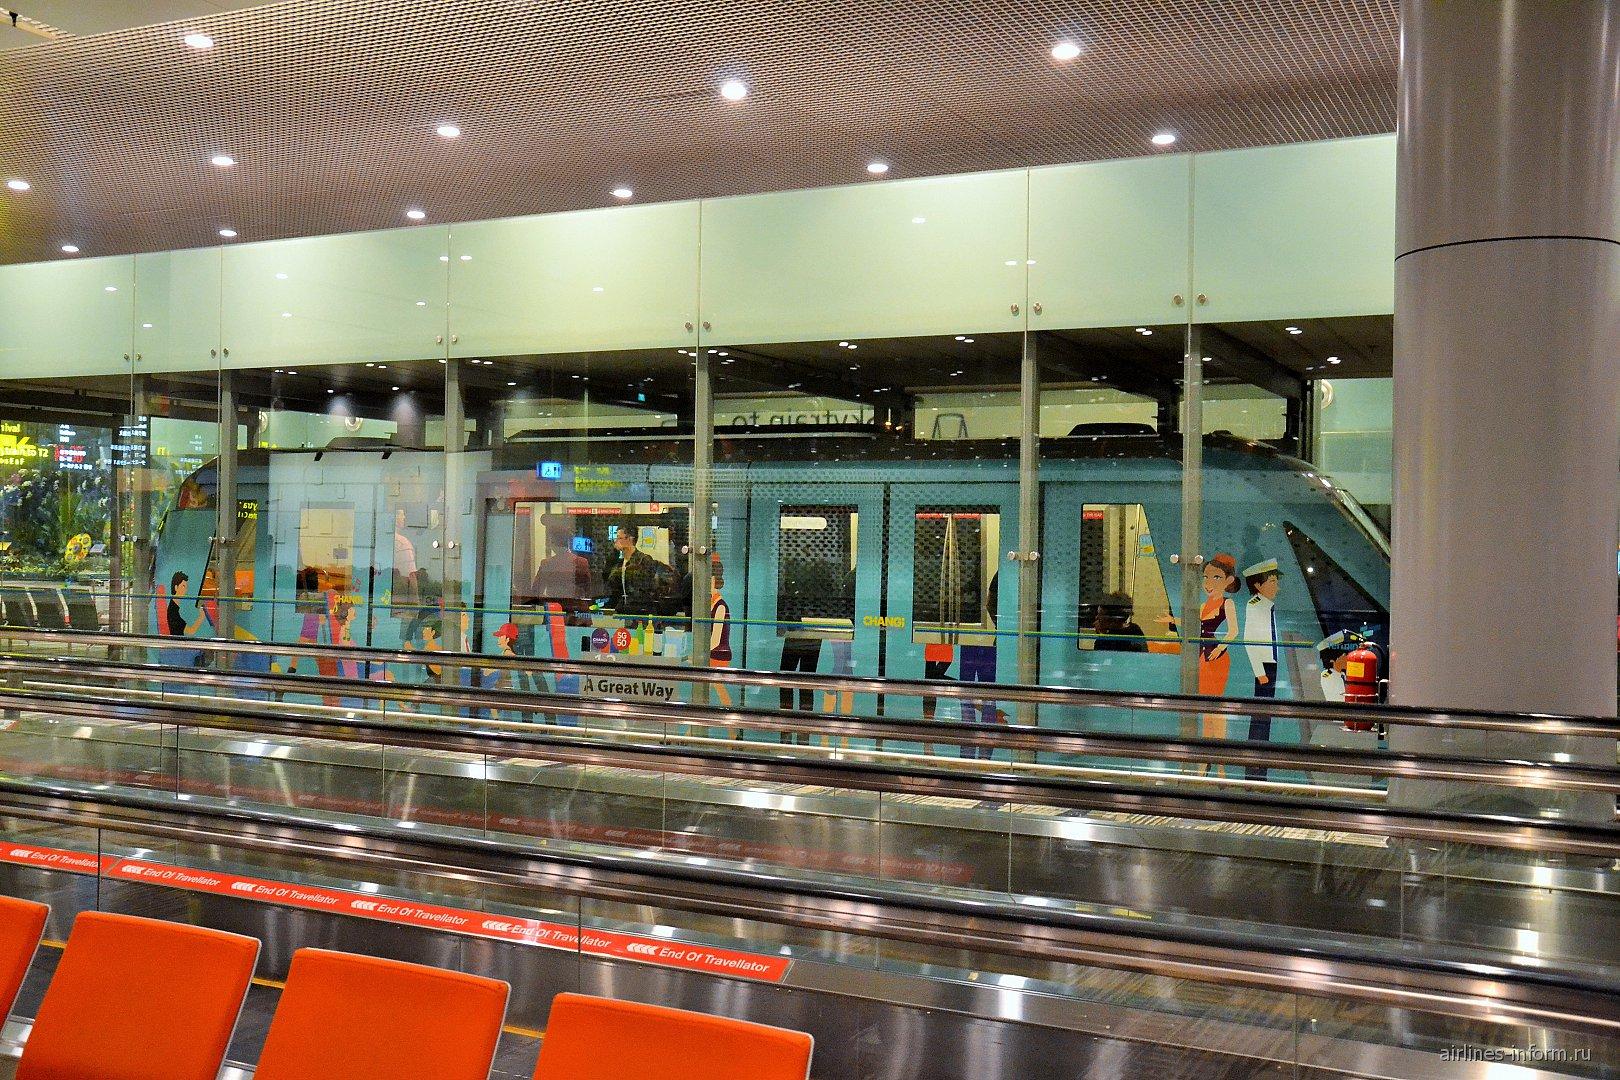 Поезд Skytrain, курсирующий между терминалами аэропорта Чанги в Сингапуре